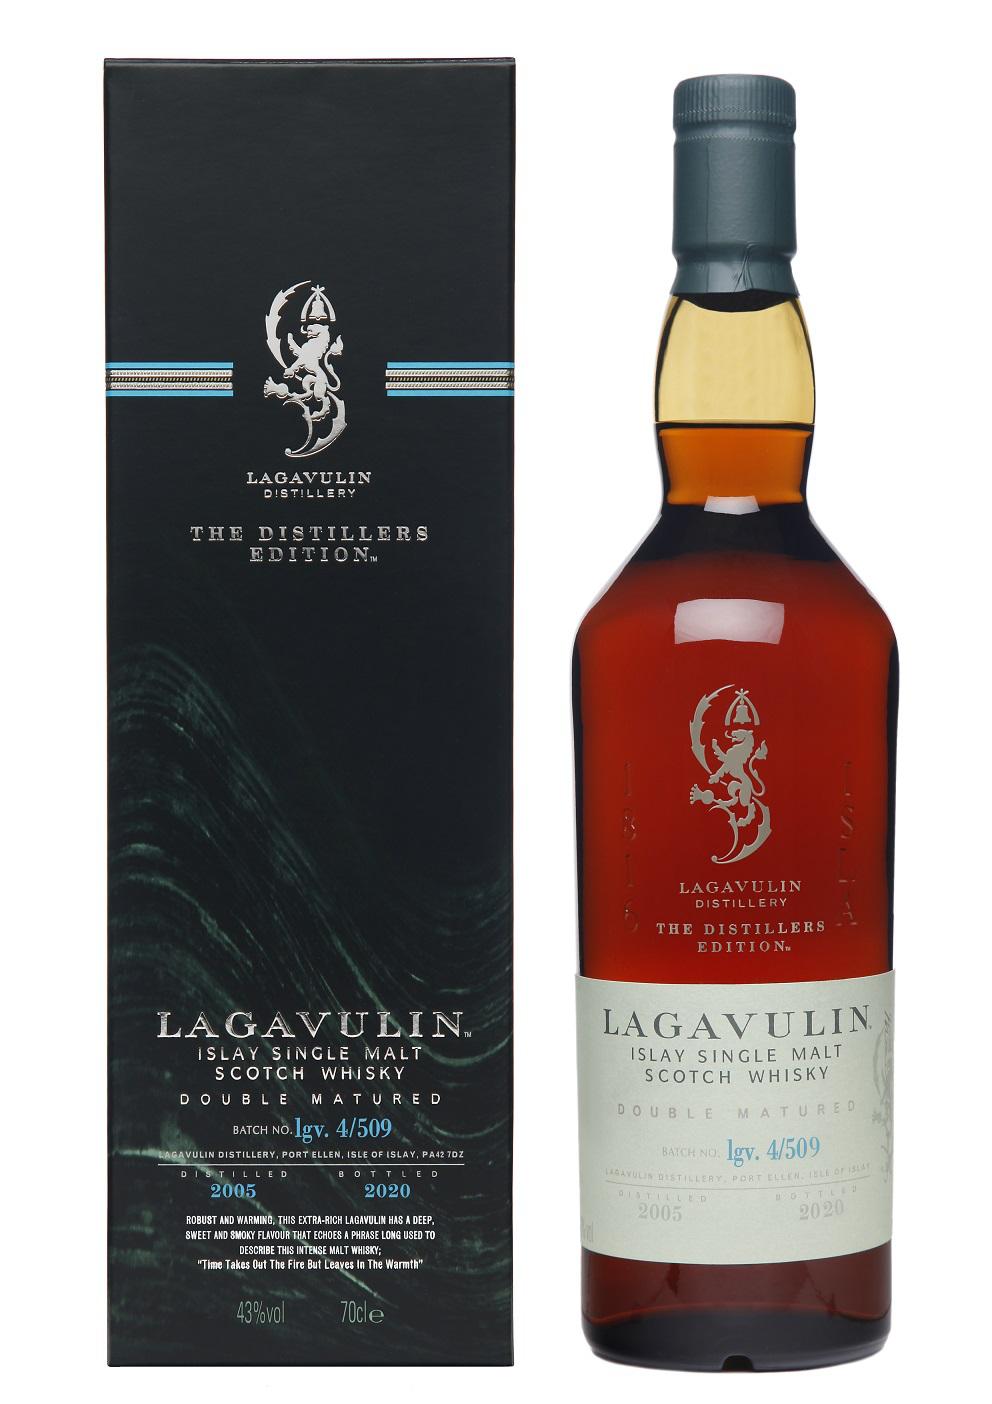 Lagavulin Distillers Edition 2020 Whisky